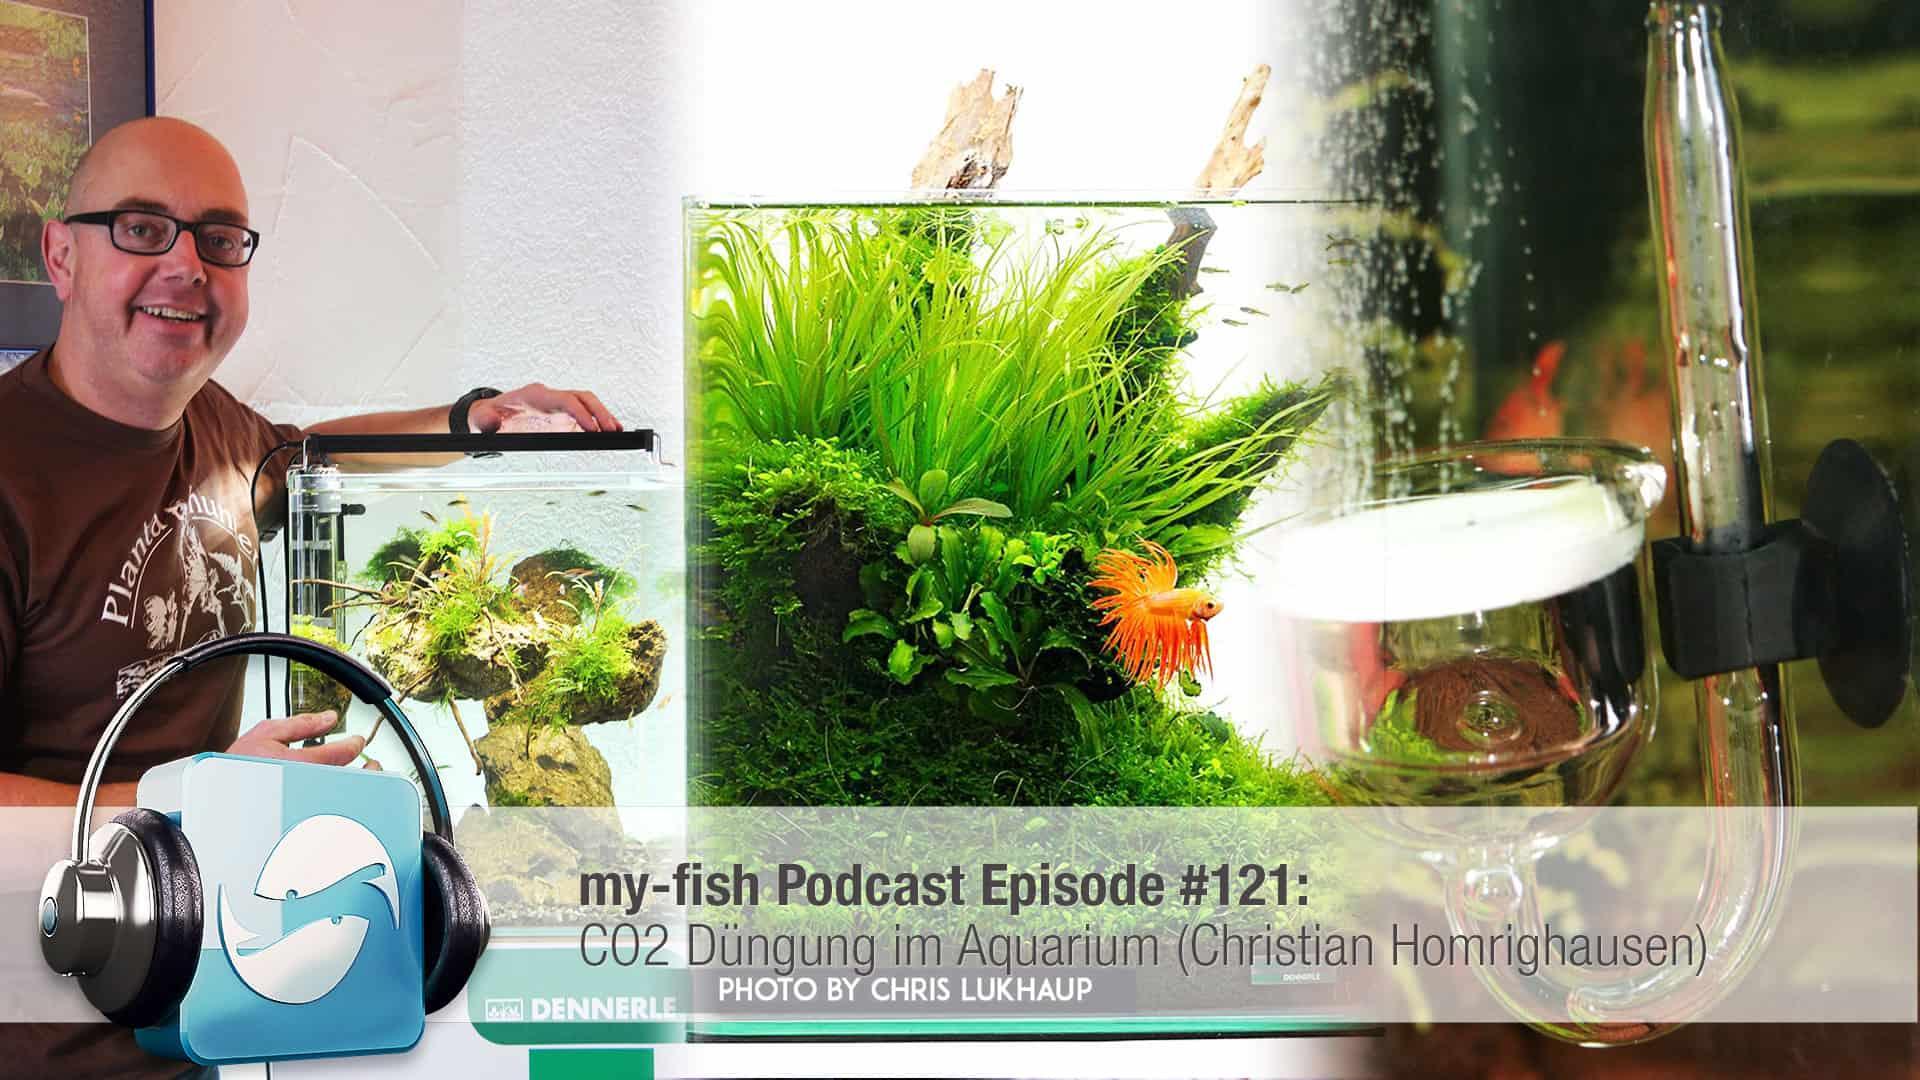 Podcast Episode #121: CO2 Düngung im Aquarium (Christian Homrighausen) 1